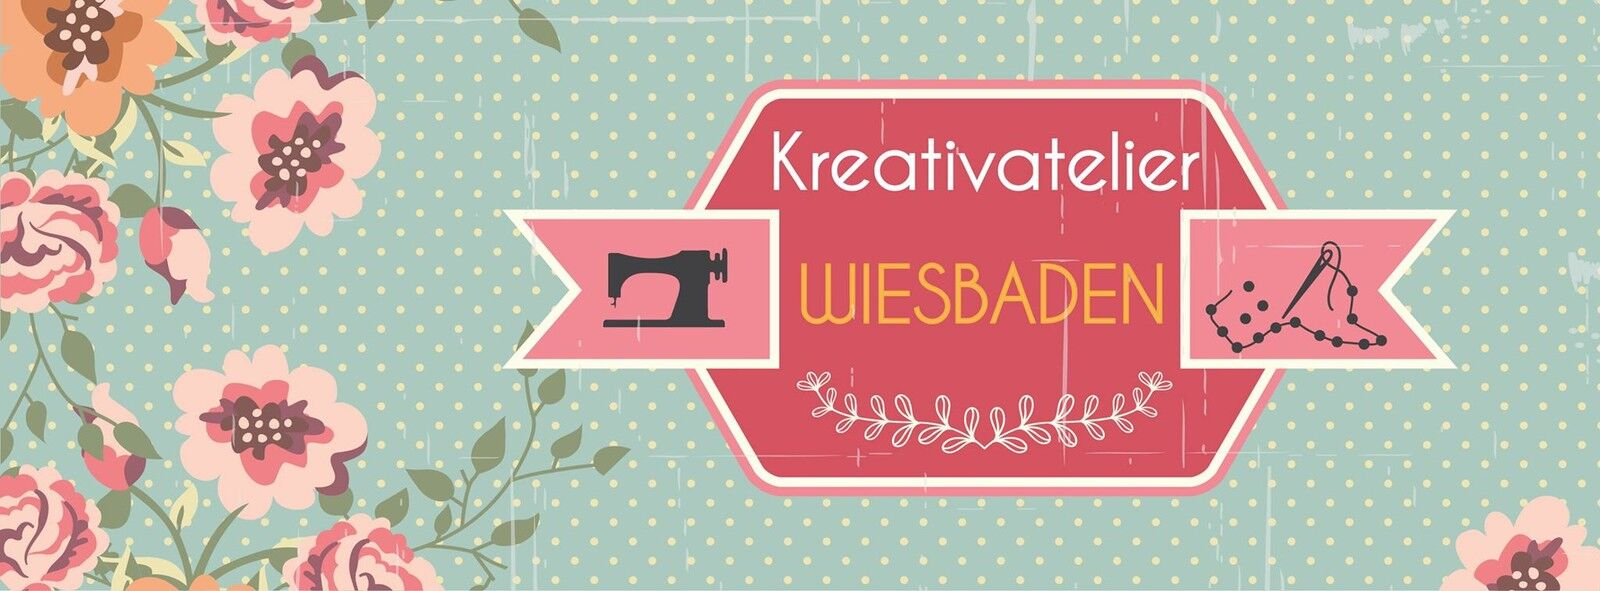 Kreativatelier-Wiesbaden